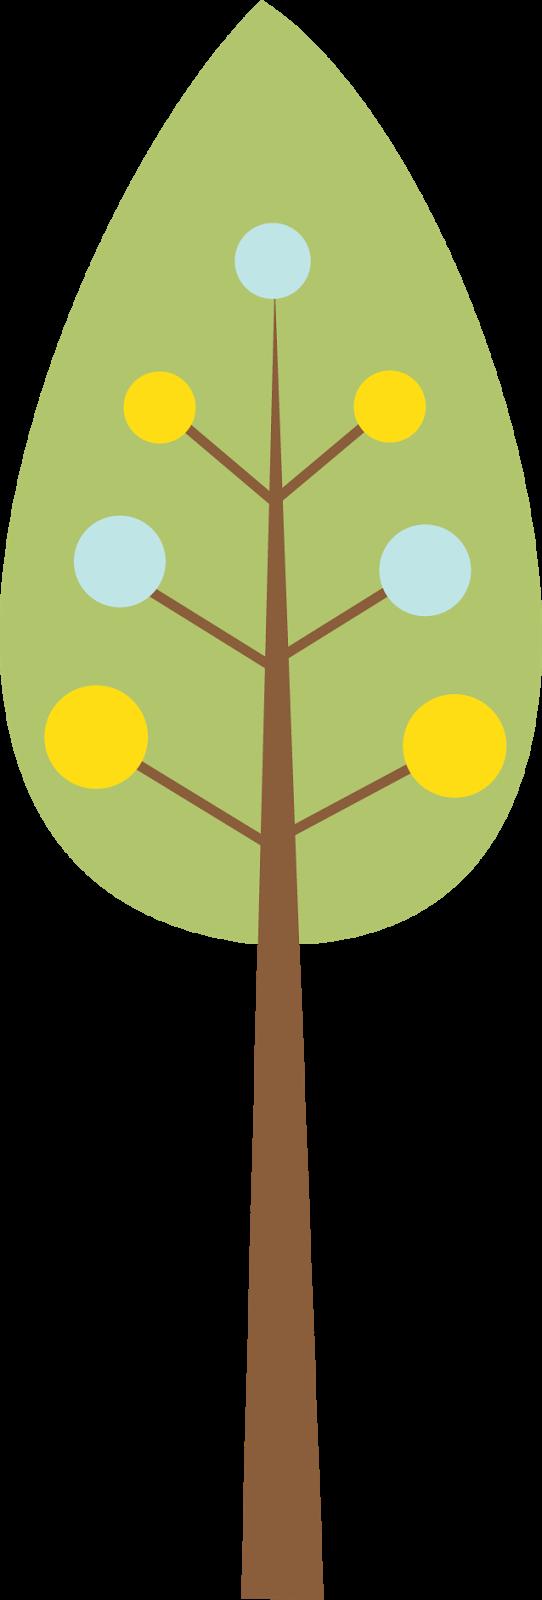 Clipart del Bosque.